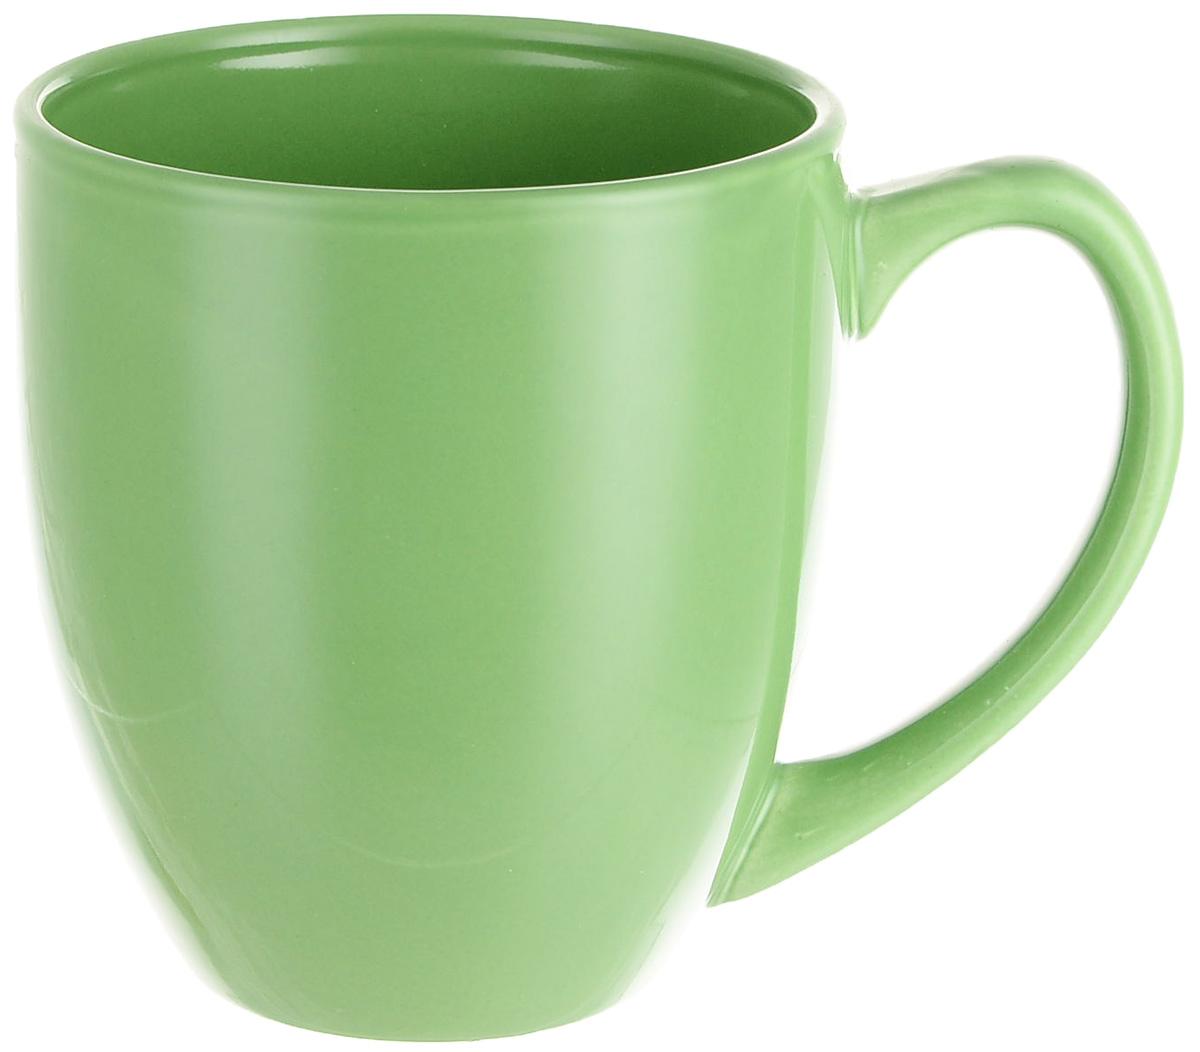 Кружка МФК-профит Color, цвет: зеленый, 425 мл кружка fireside chat 425 мл